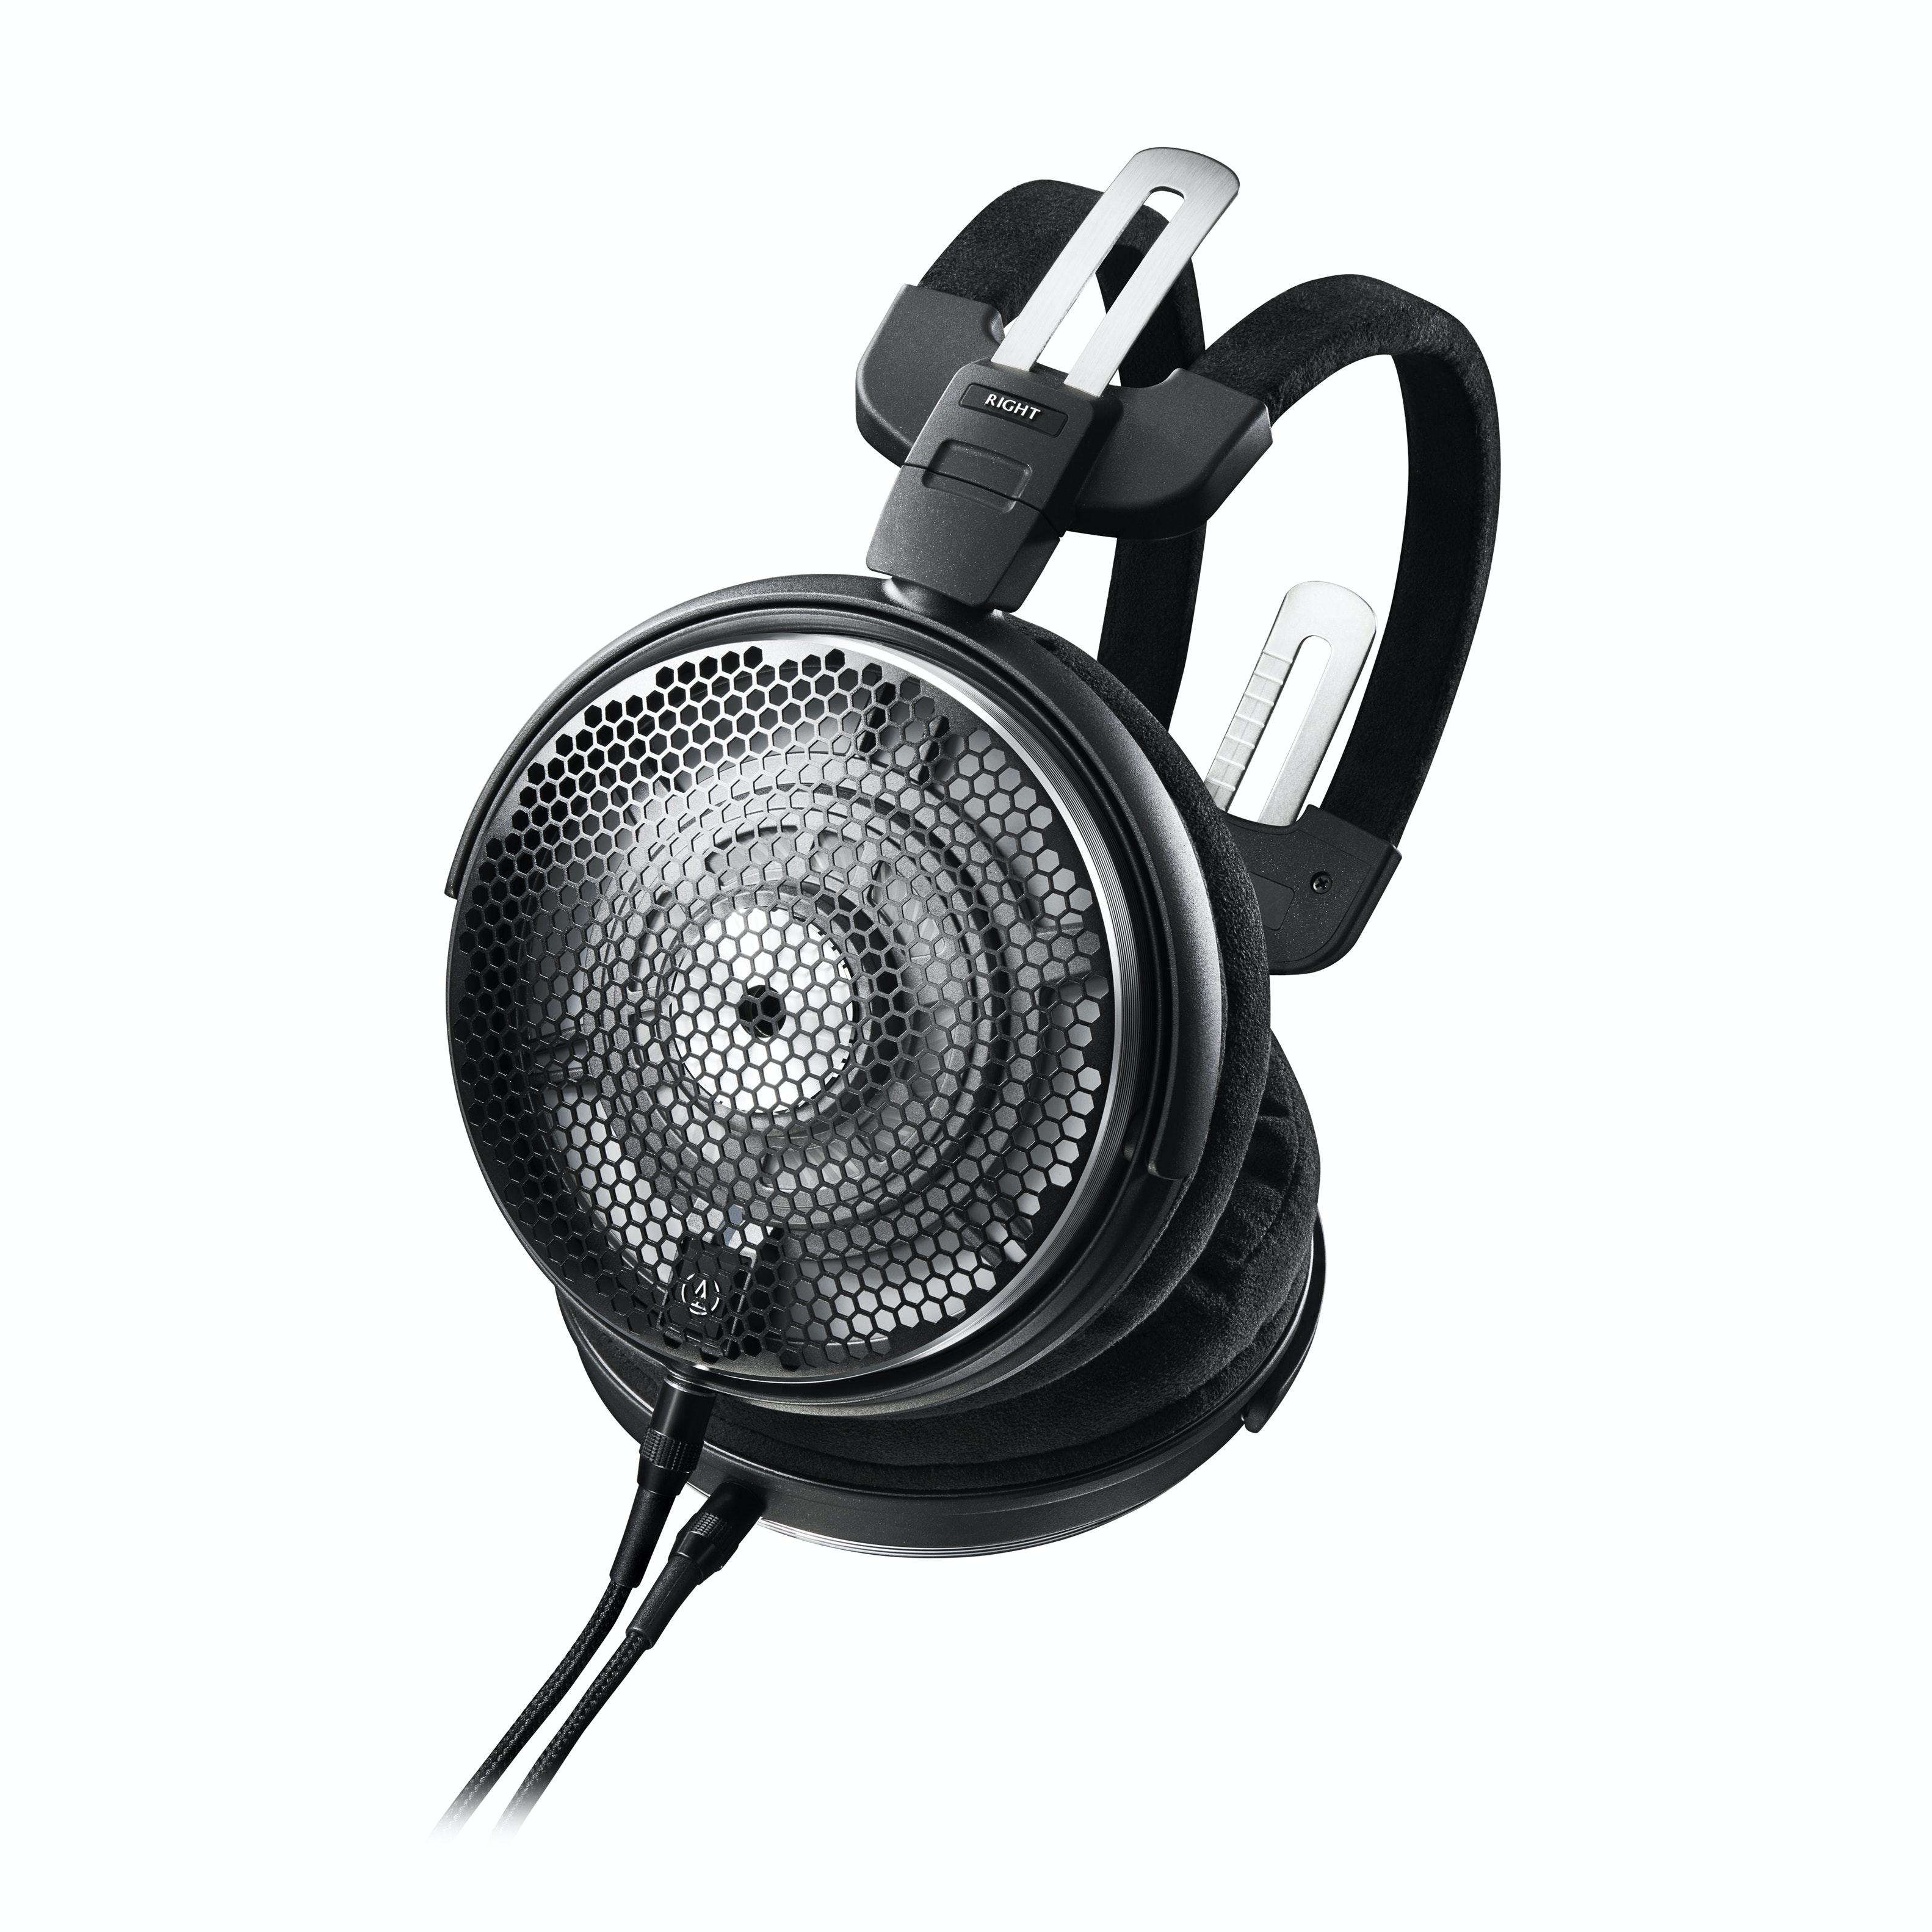 ATH-ADX5000 Audiophile Open-Air Dynamic Headphones    Audio-Technica US